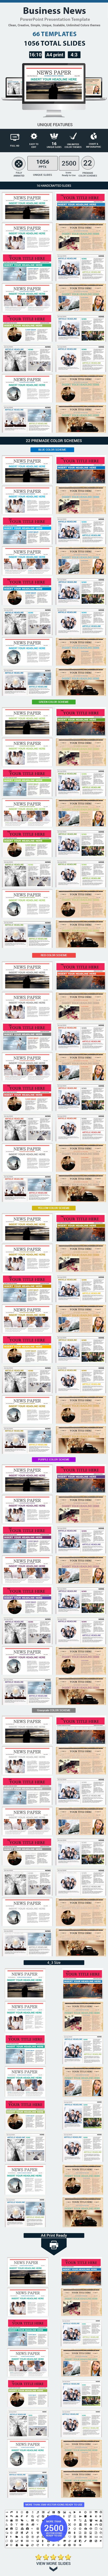 Business News  PowerPoint Presentation Template - Business PowerPoint Templates